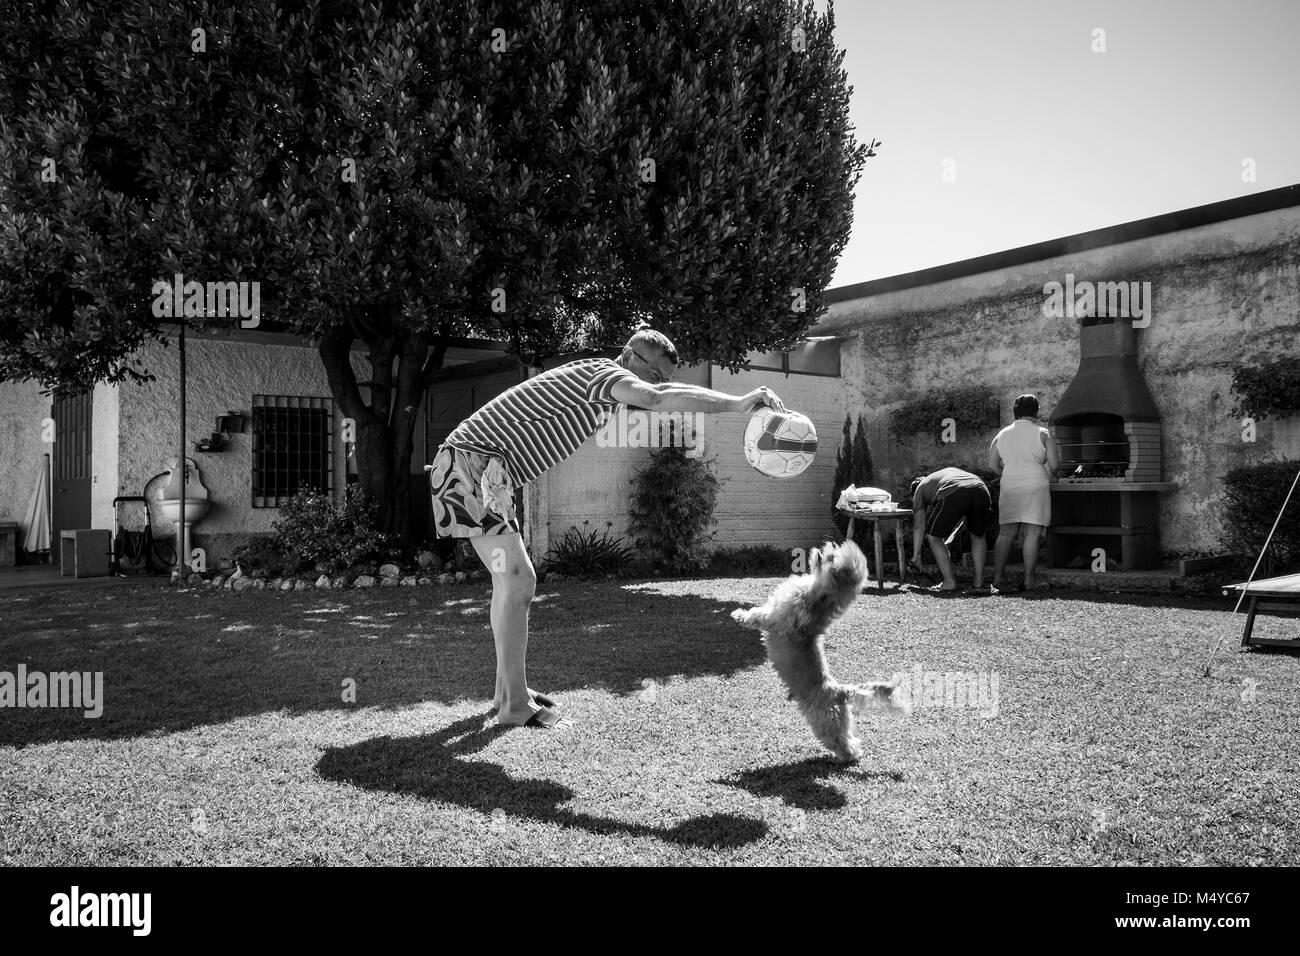 Italy, Casorezzo, Family 'Ferragosto celebration' - Stock Image